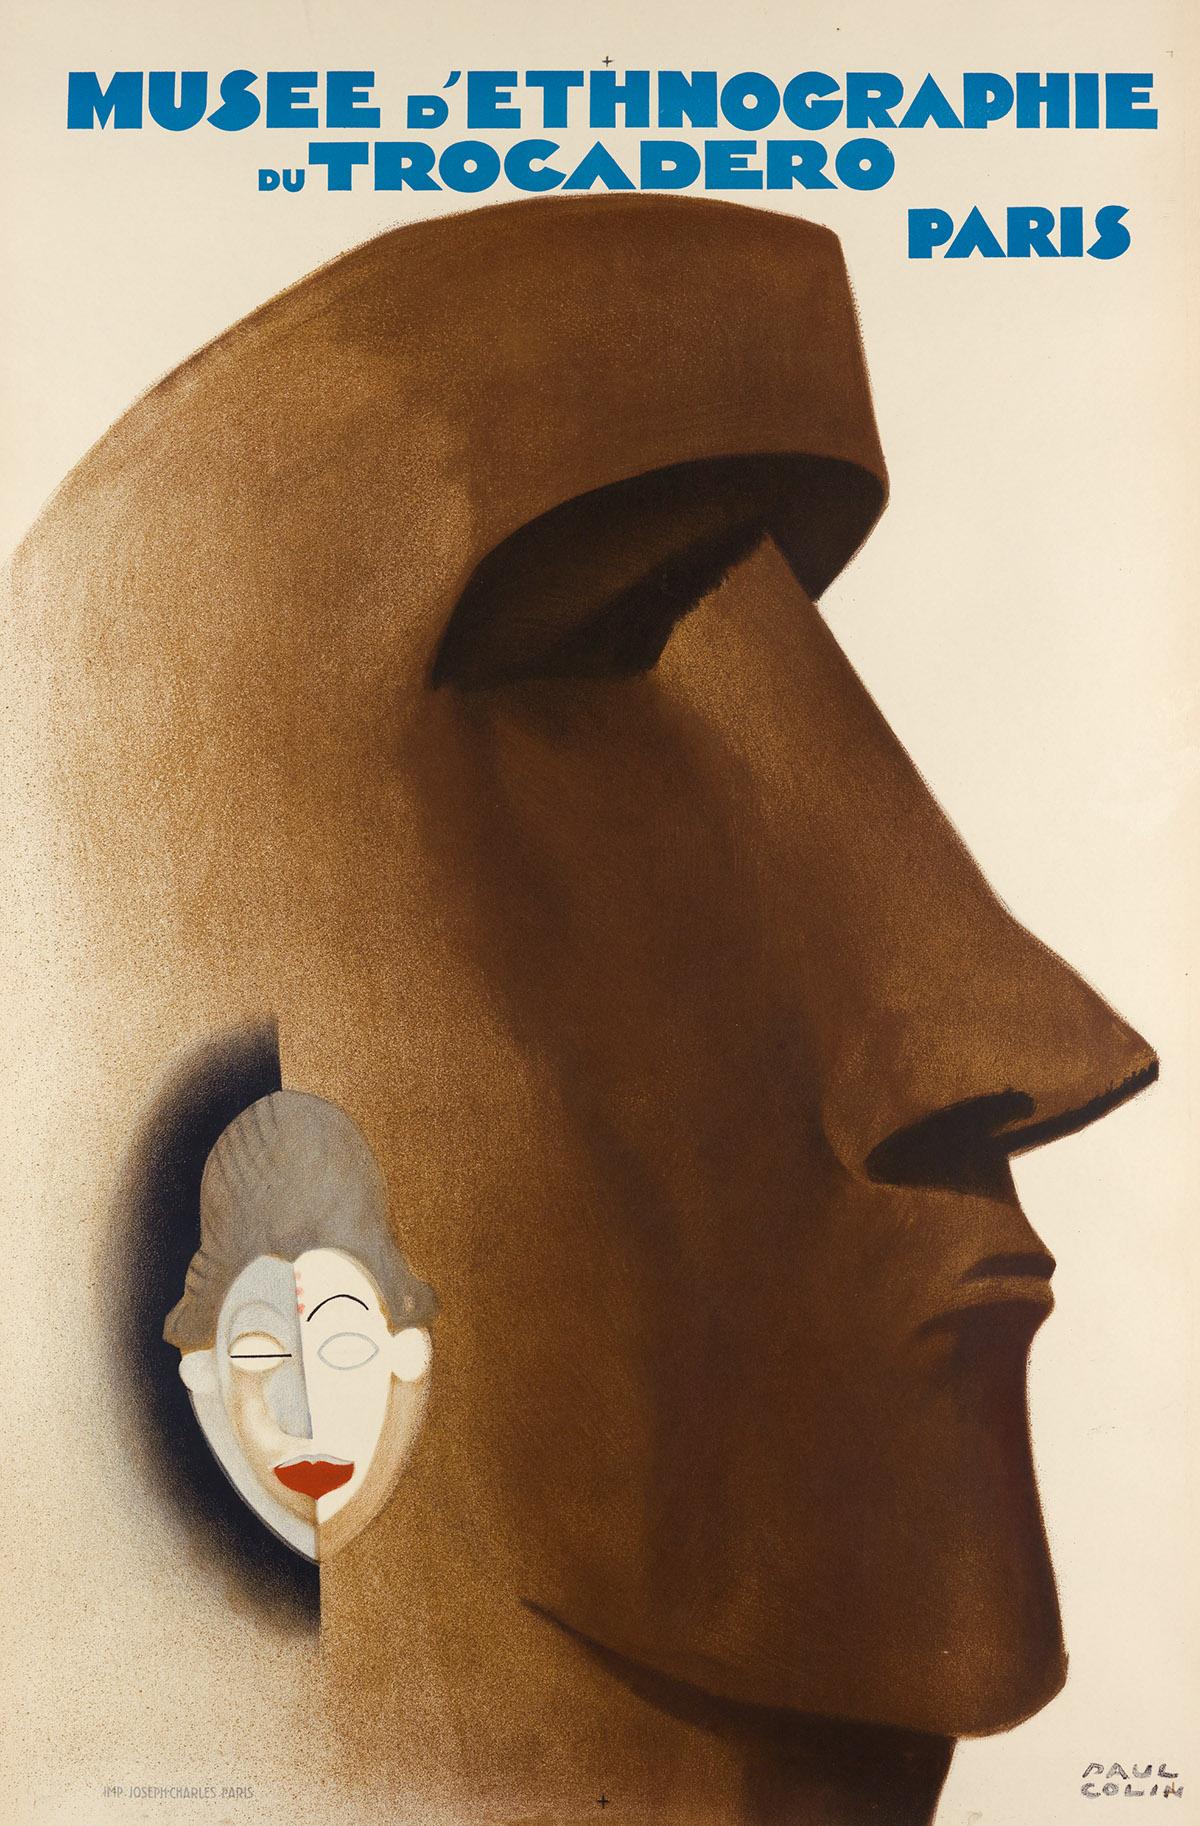 PAUL COLIN (1892-1986). MUSEE DETHNOGRAPHIE DU TROCADERO / PARIS. 1930. 47x31 inches, 119x79 cm. Joseph-Charles, Paris.